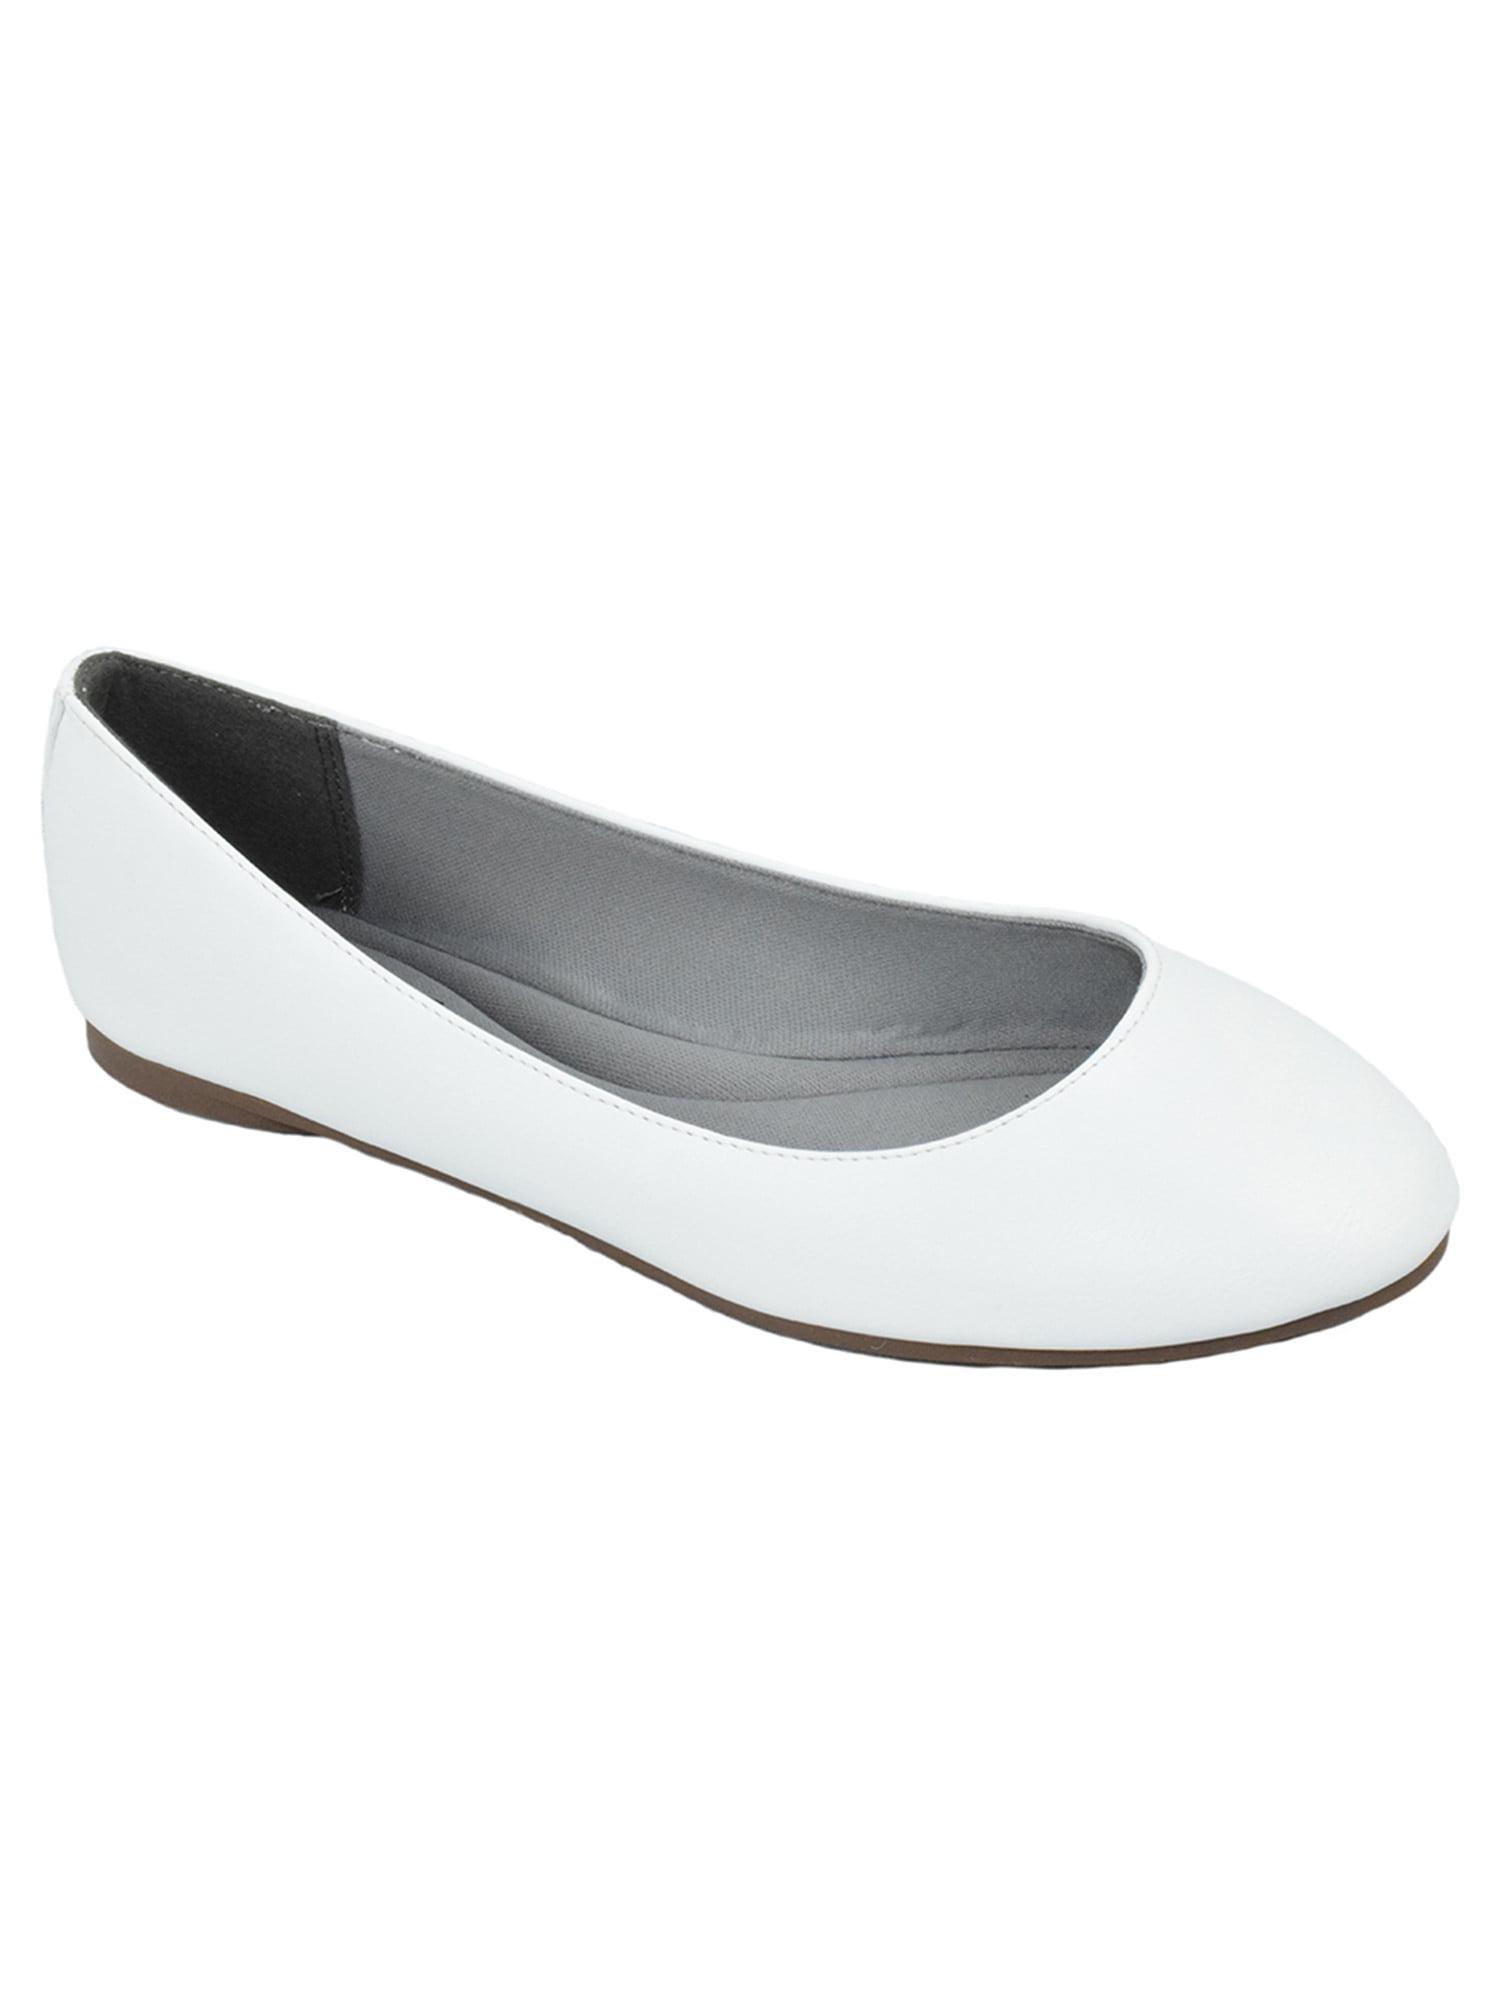 White All Womens Flats - Walmart.com